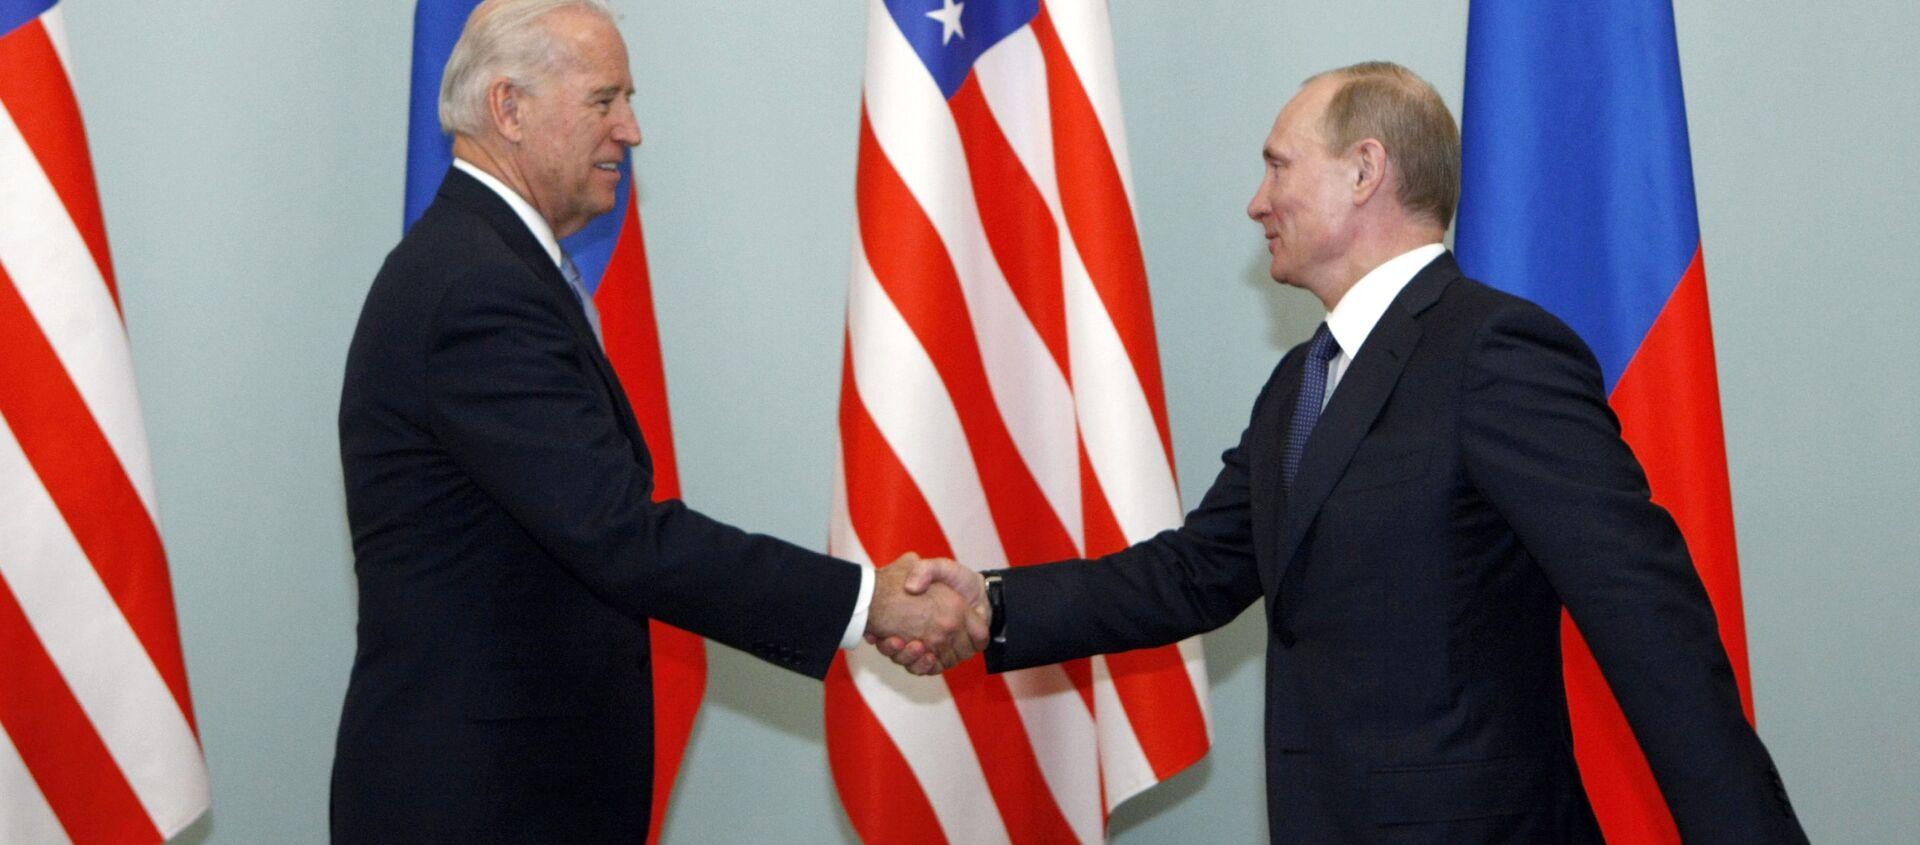 Joe Biden và Vladimir Putin - Sputnik Việt Nam, 1920, 14.06.2021